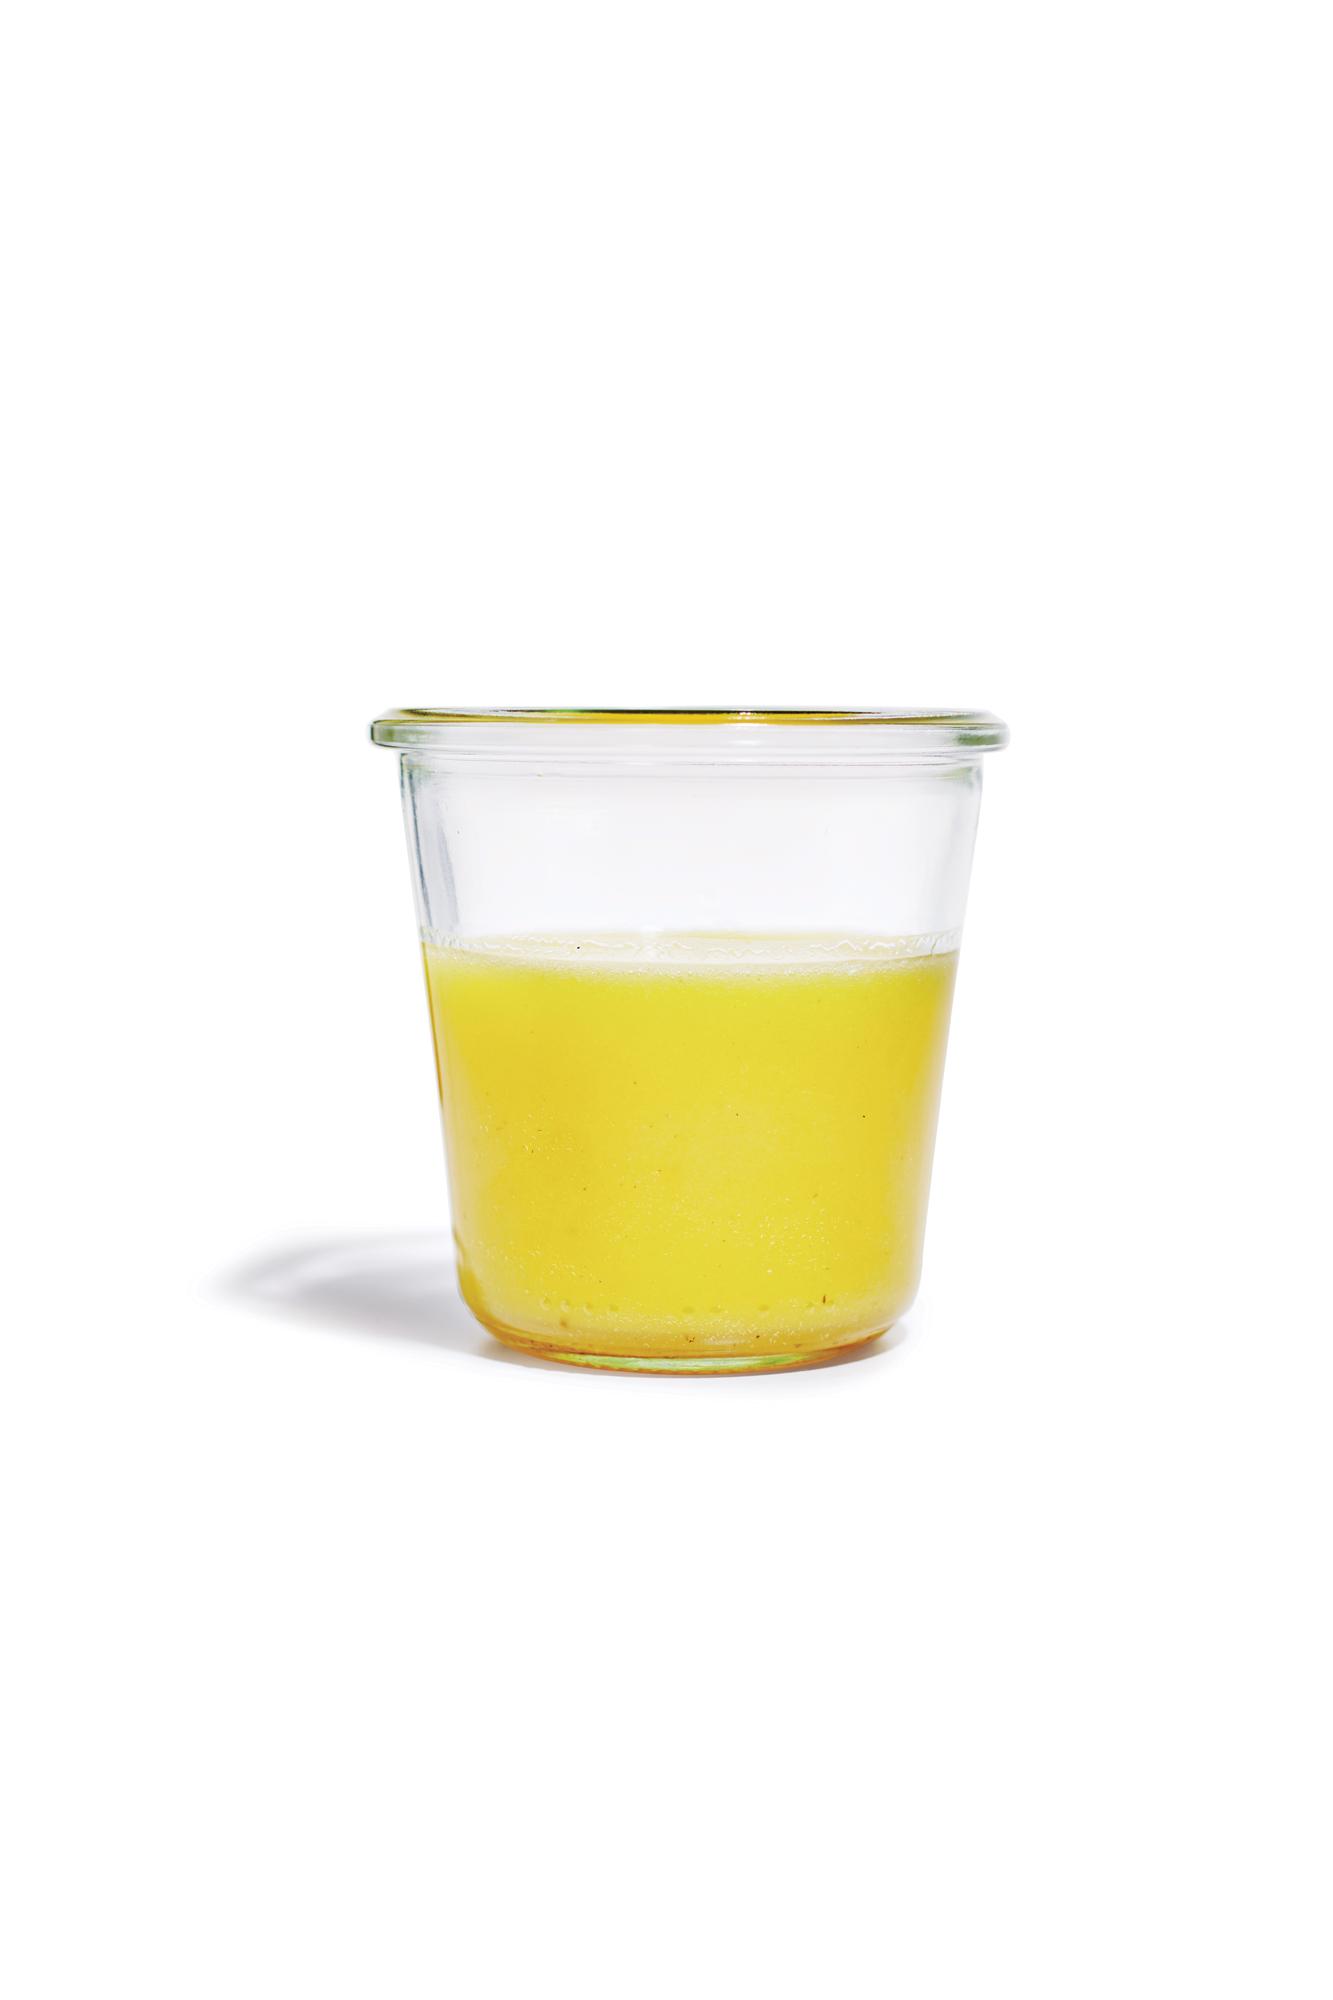 Lemon Vinaigrette